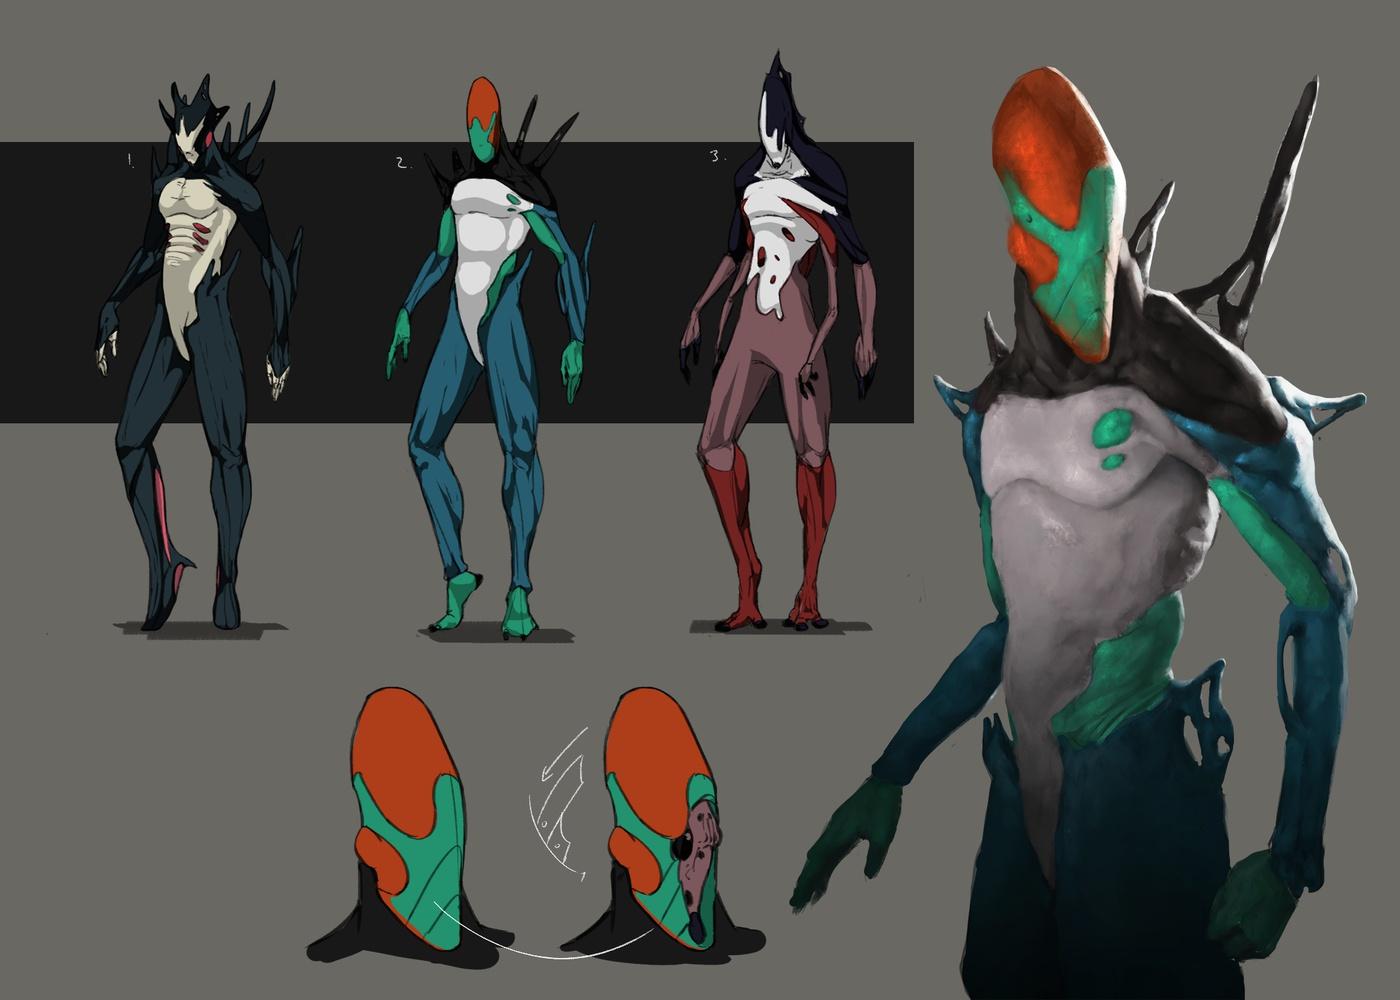 2d illustration digital digital art alien sci-fi concept design